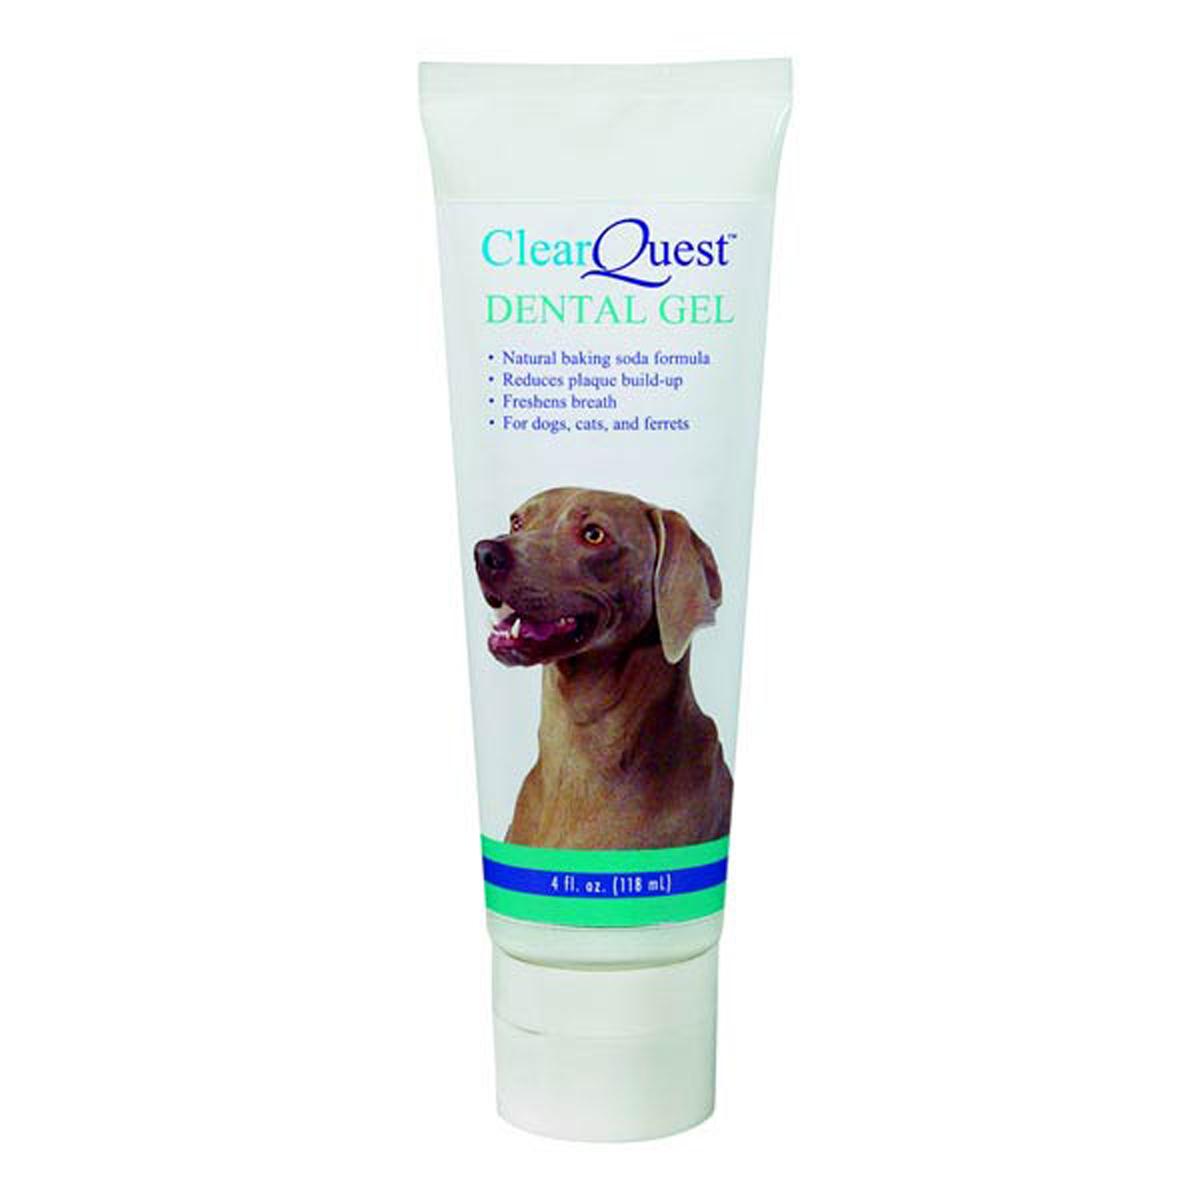 ClearQuest Pet Dental Gel